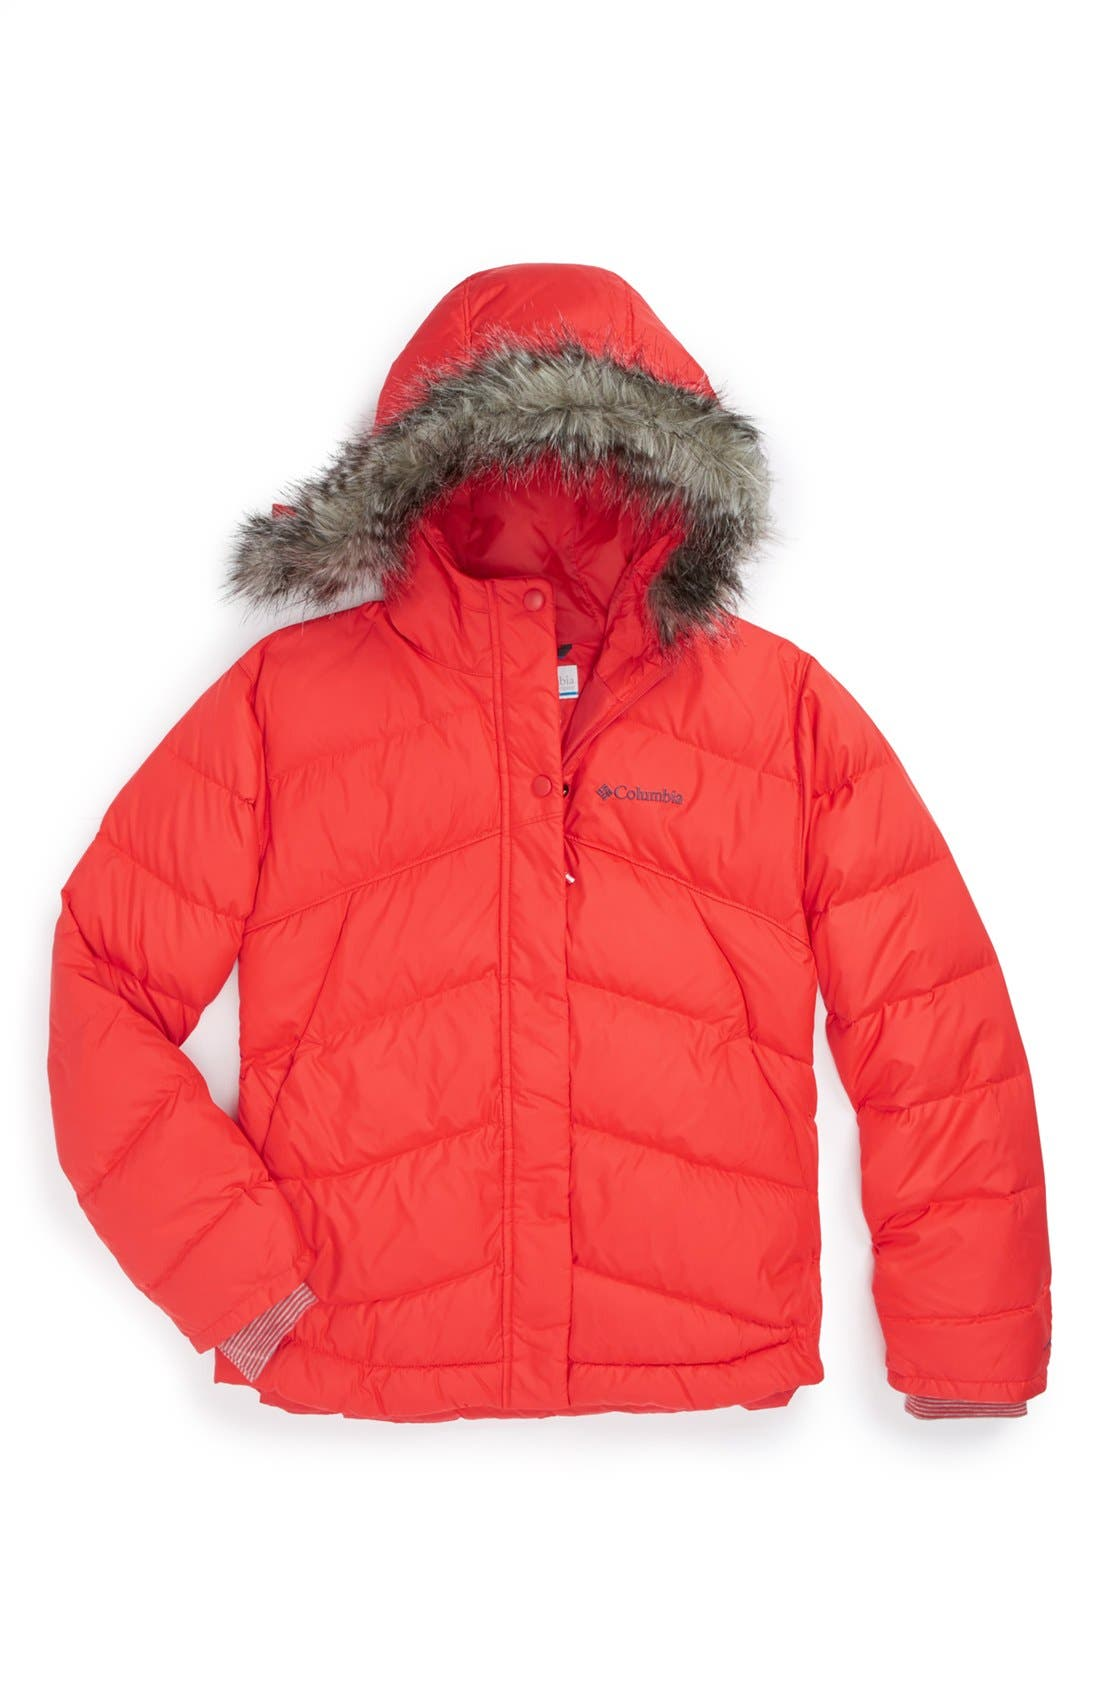 Alternate Image 1 Selected - Columbia 'Alpine Glow' Jacket (Big Girls)